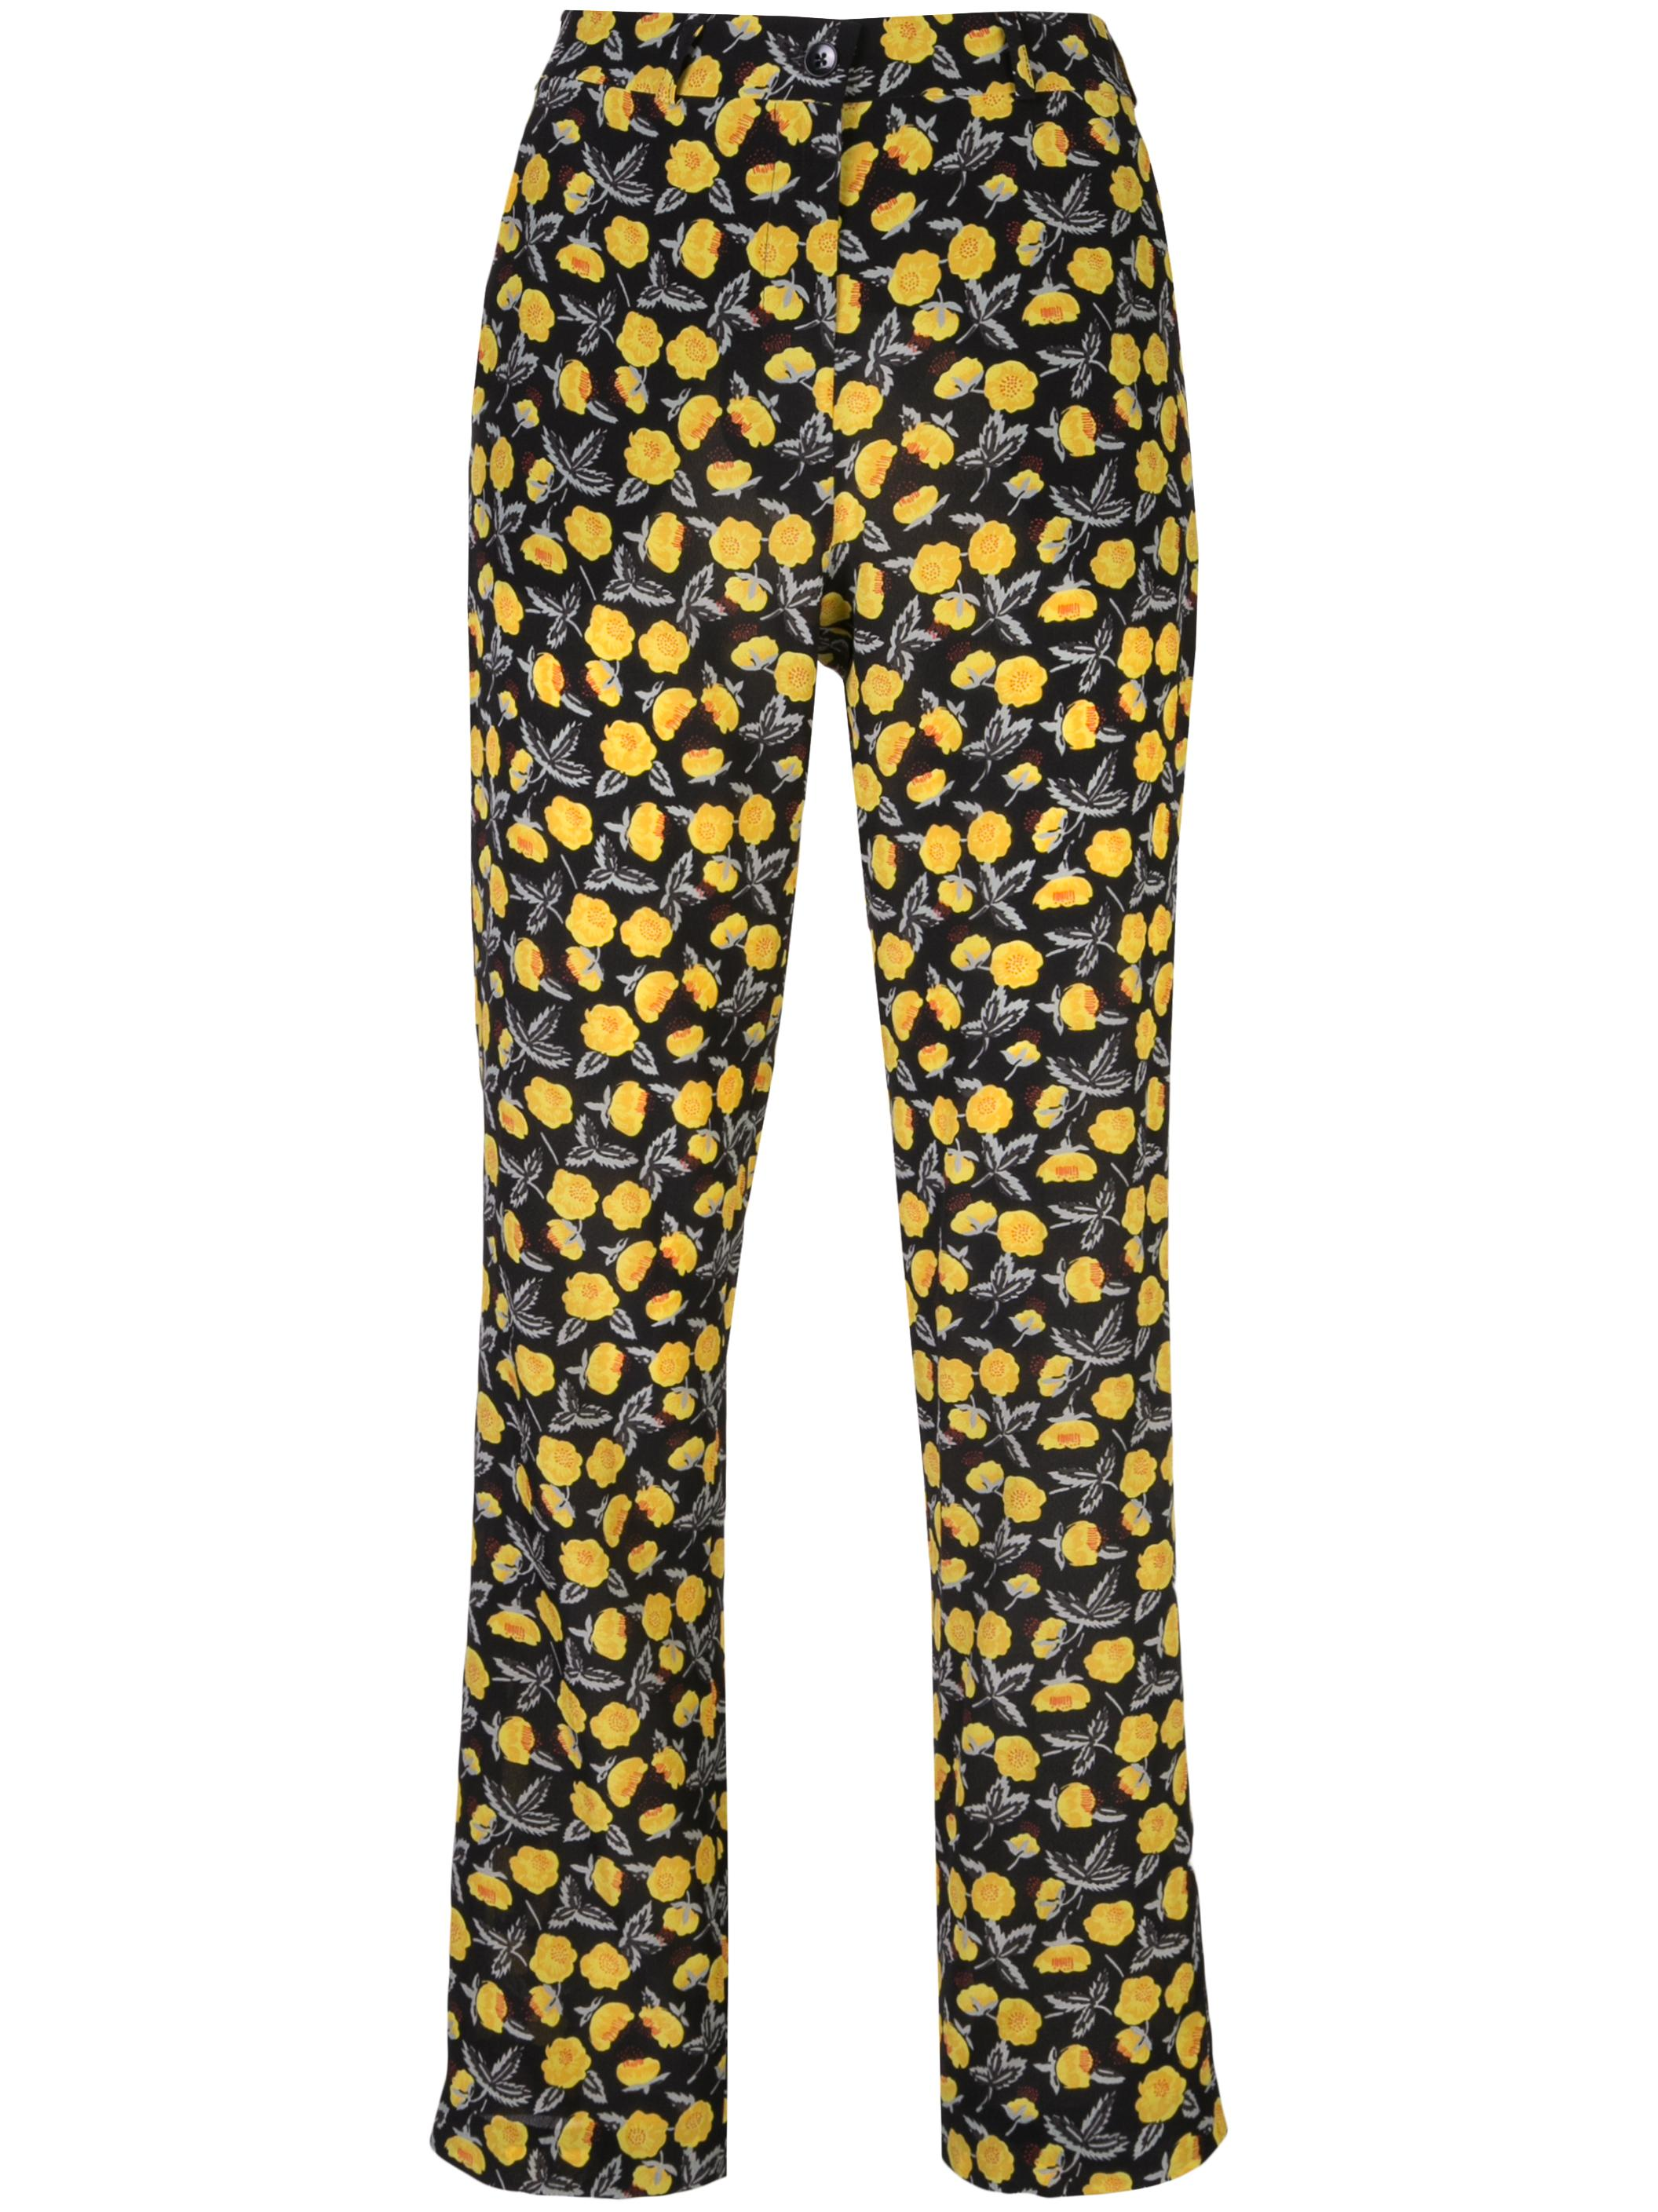 Violante Floral Printed Trouser